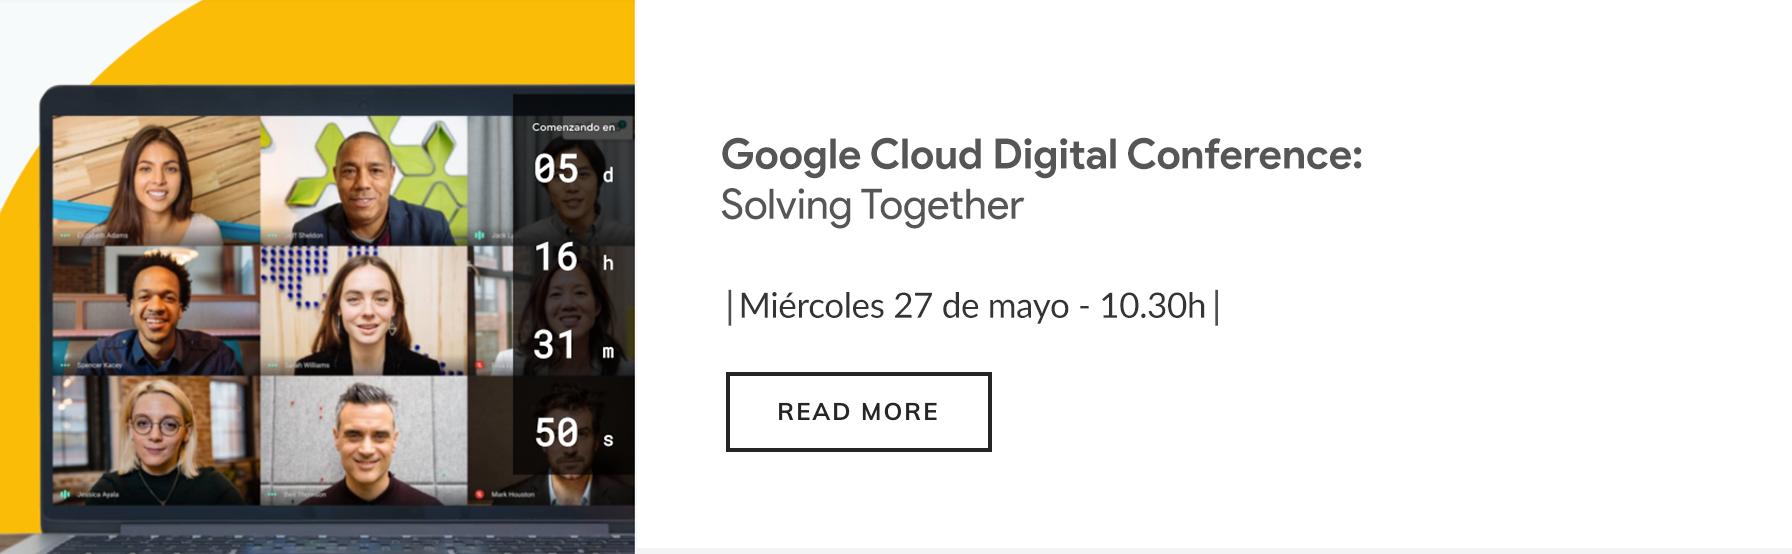 eventos-web-google-27-mayo